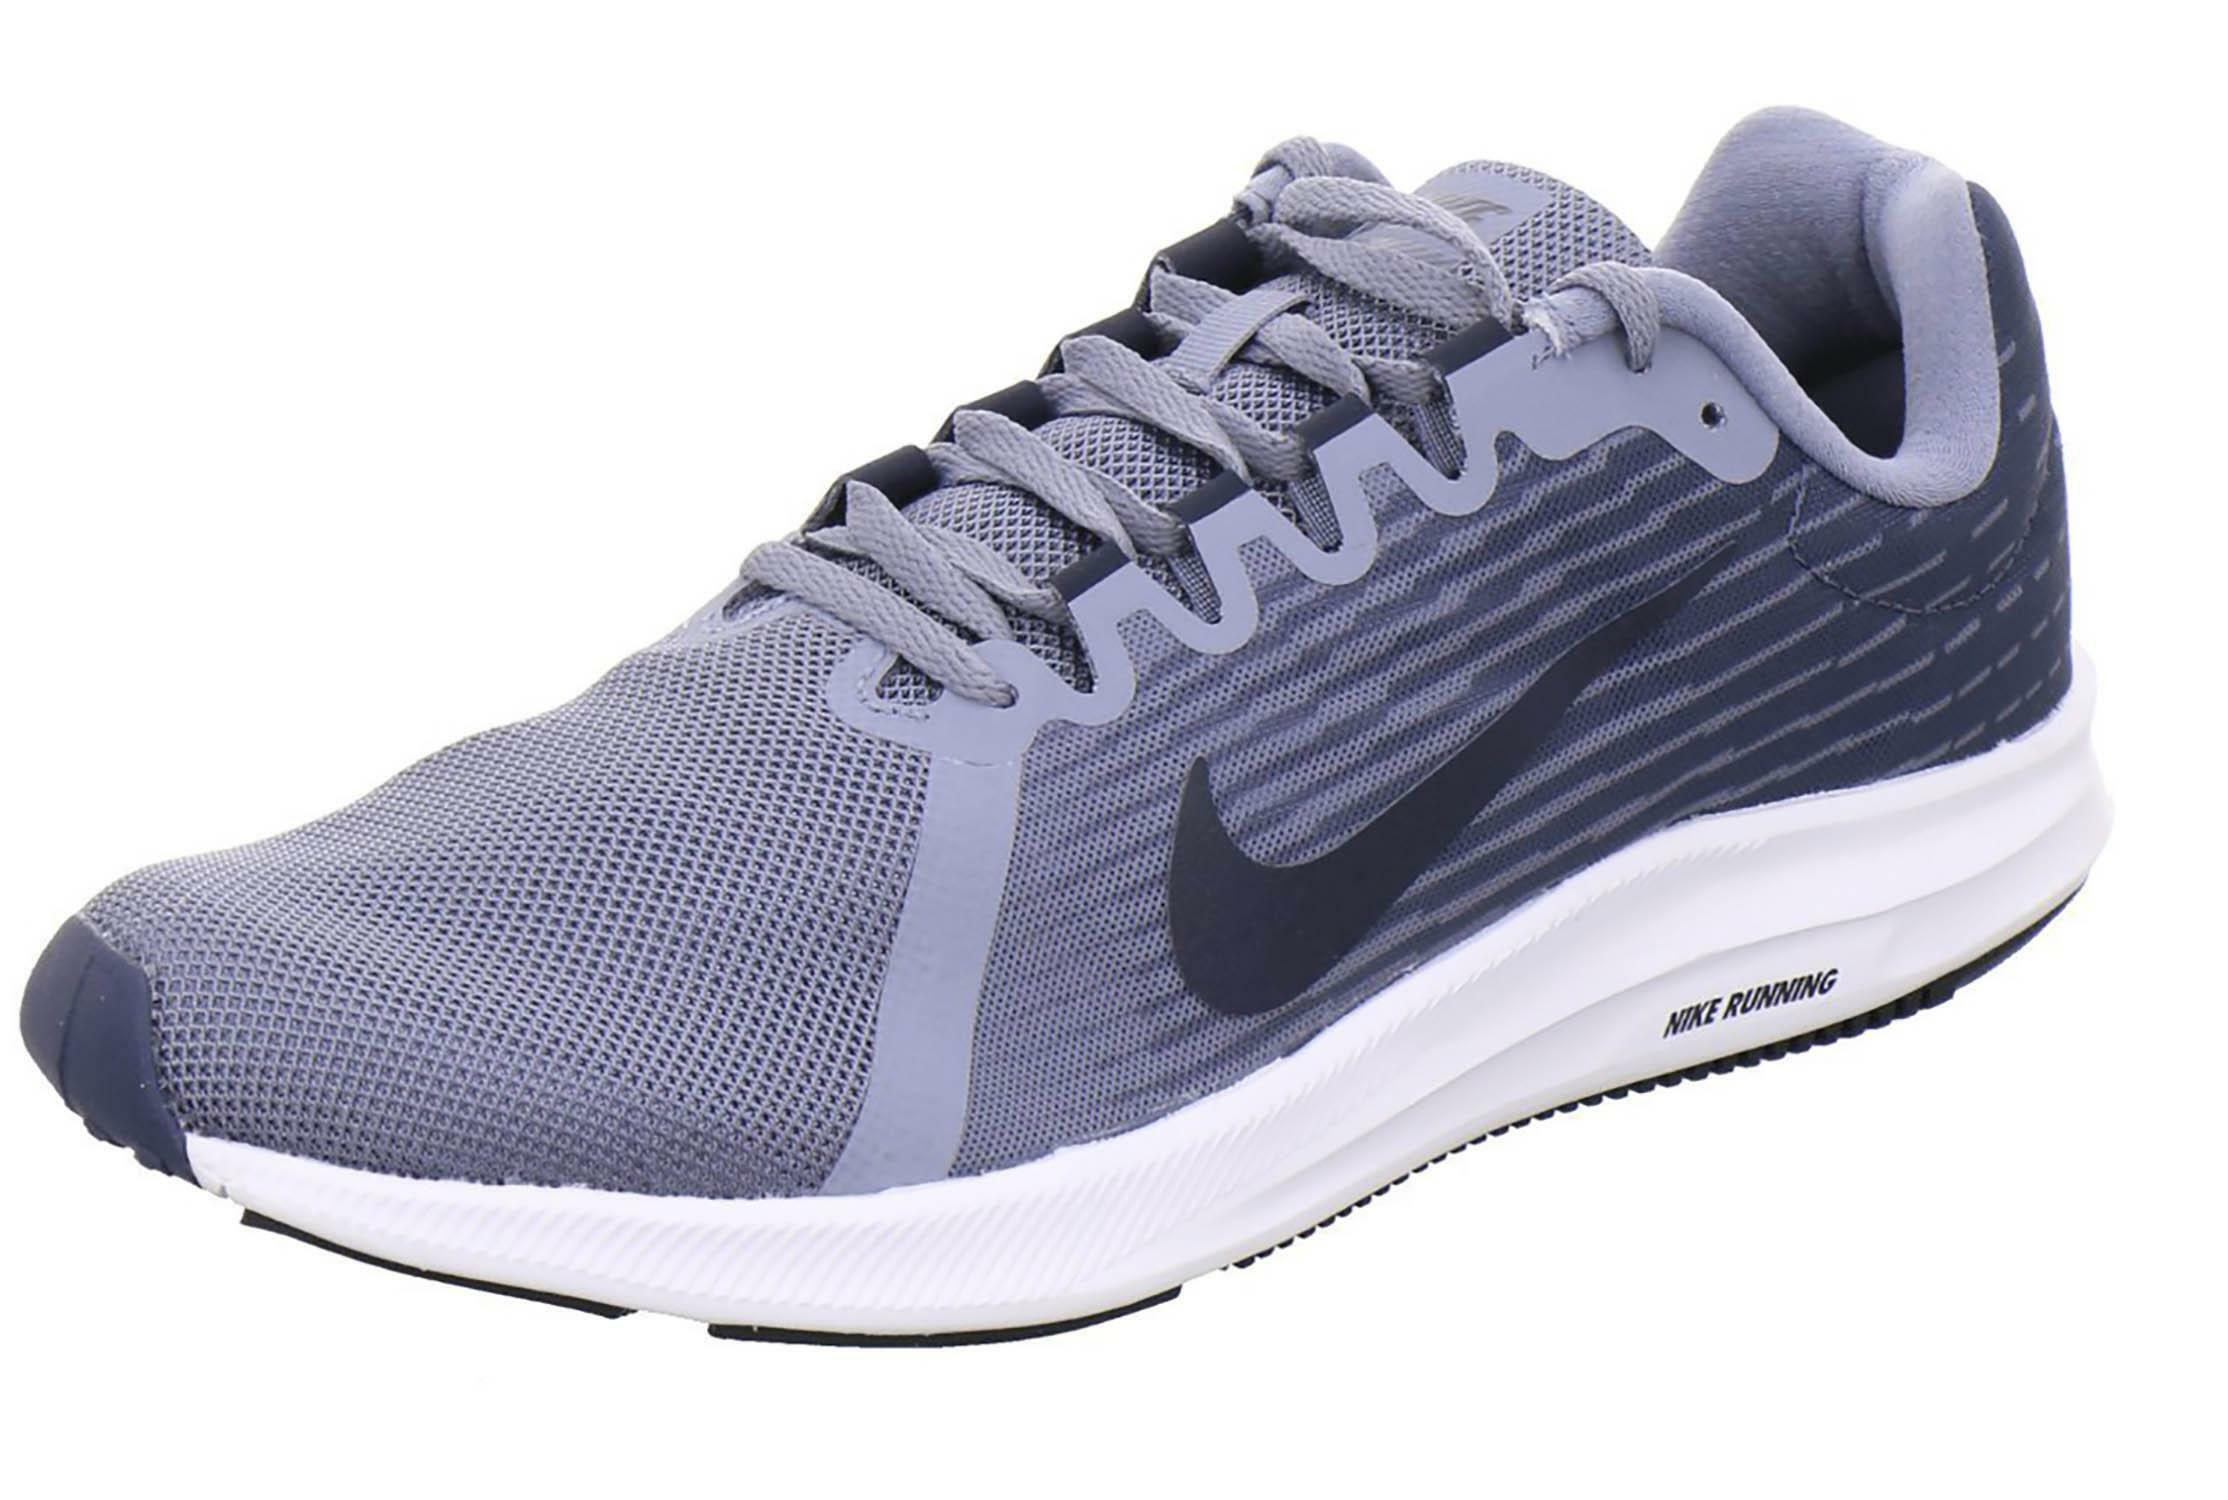 Downshifter 908984402 Hommes Sport De 8 Chaussures Nike Gris ZRgfqO